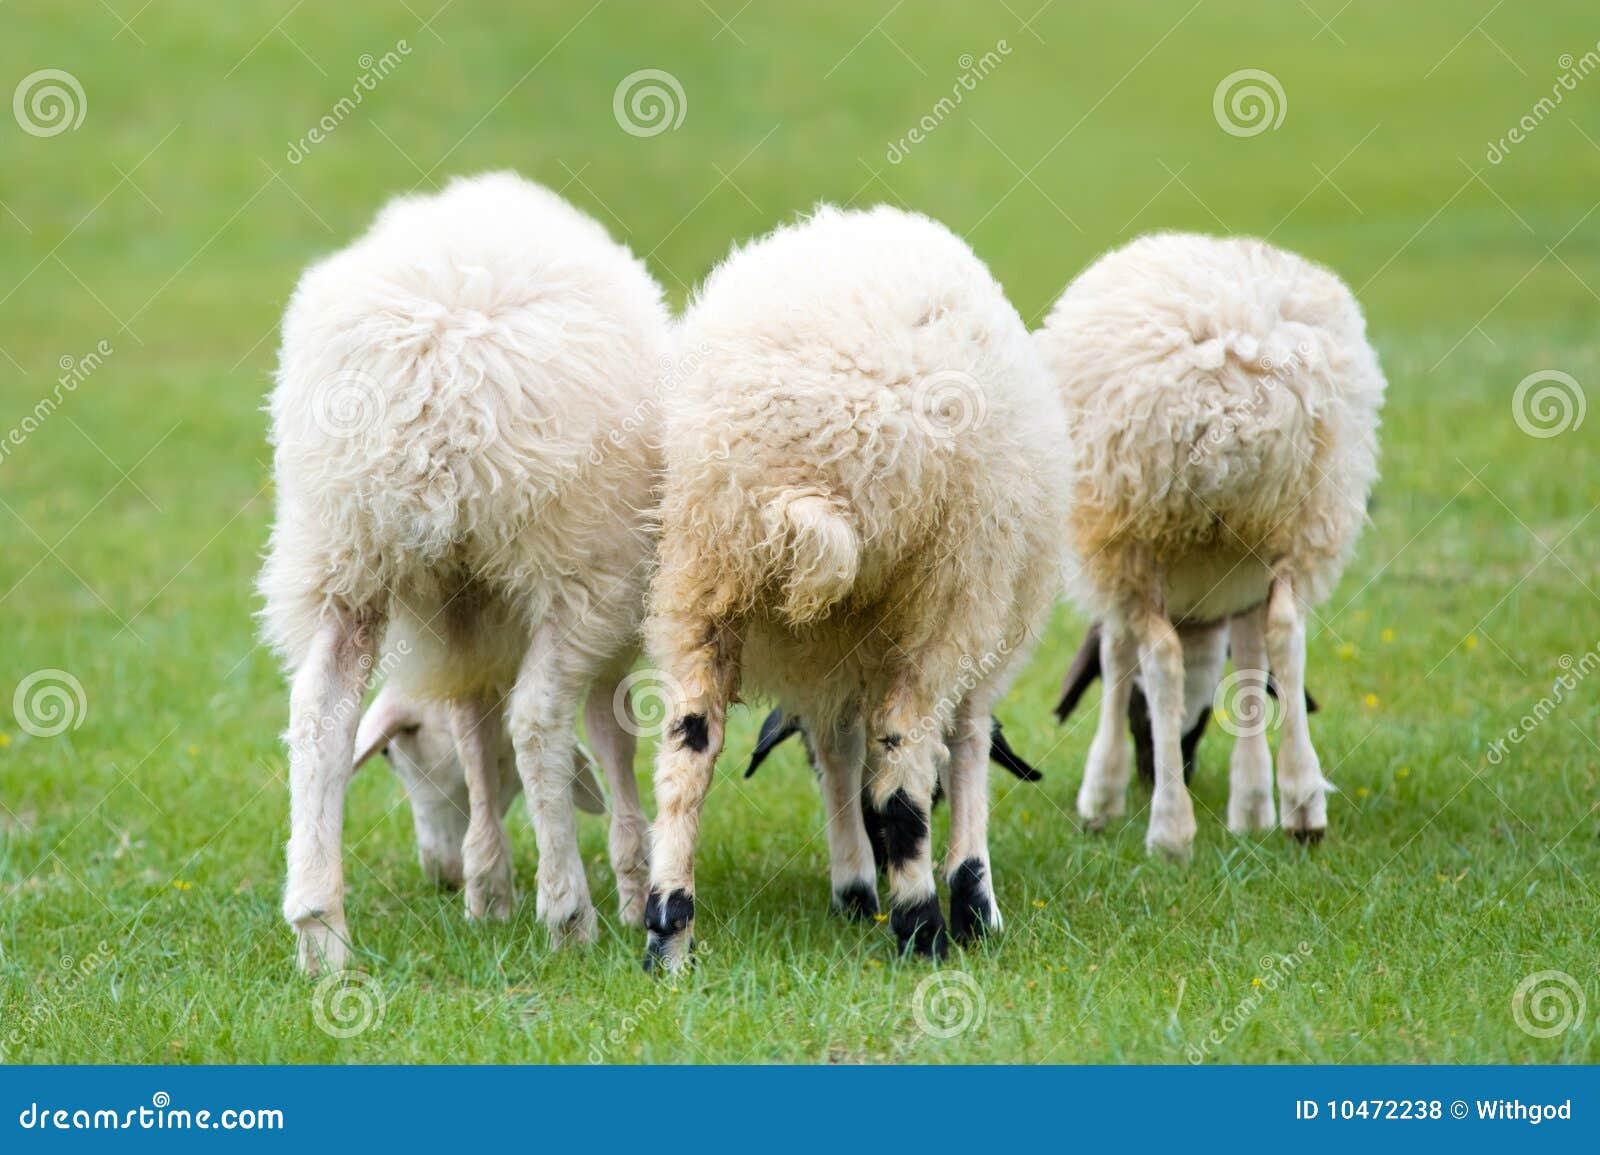 Three sheep - photo#25